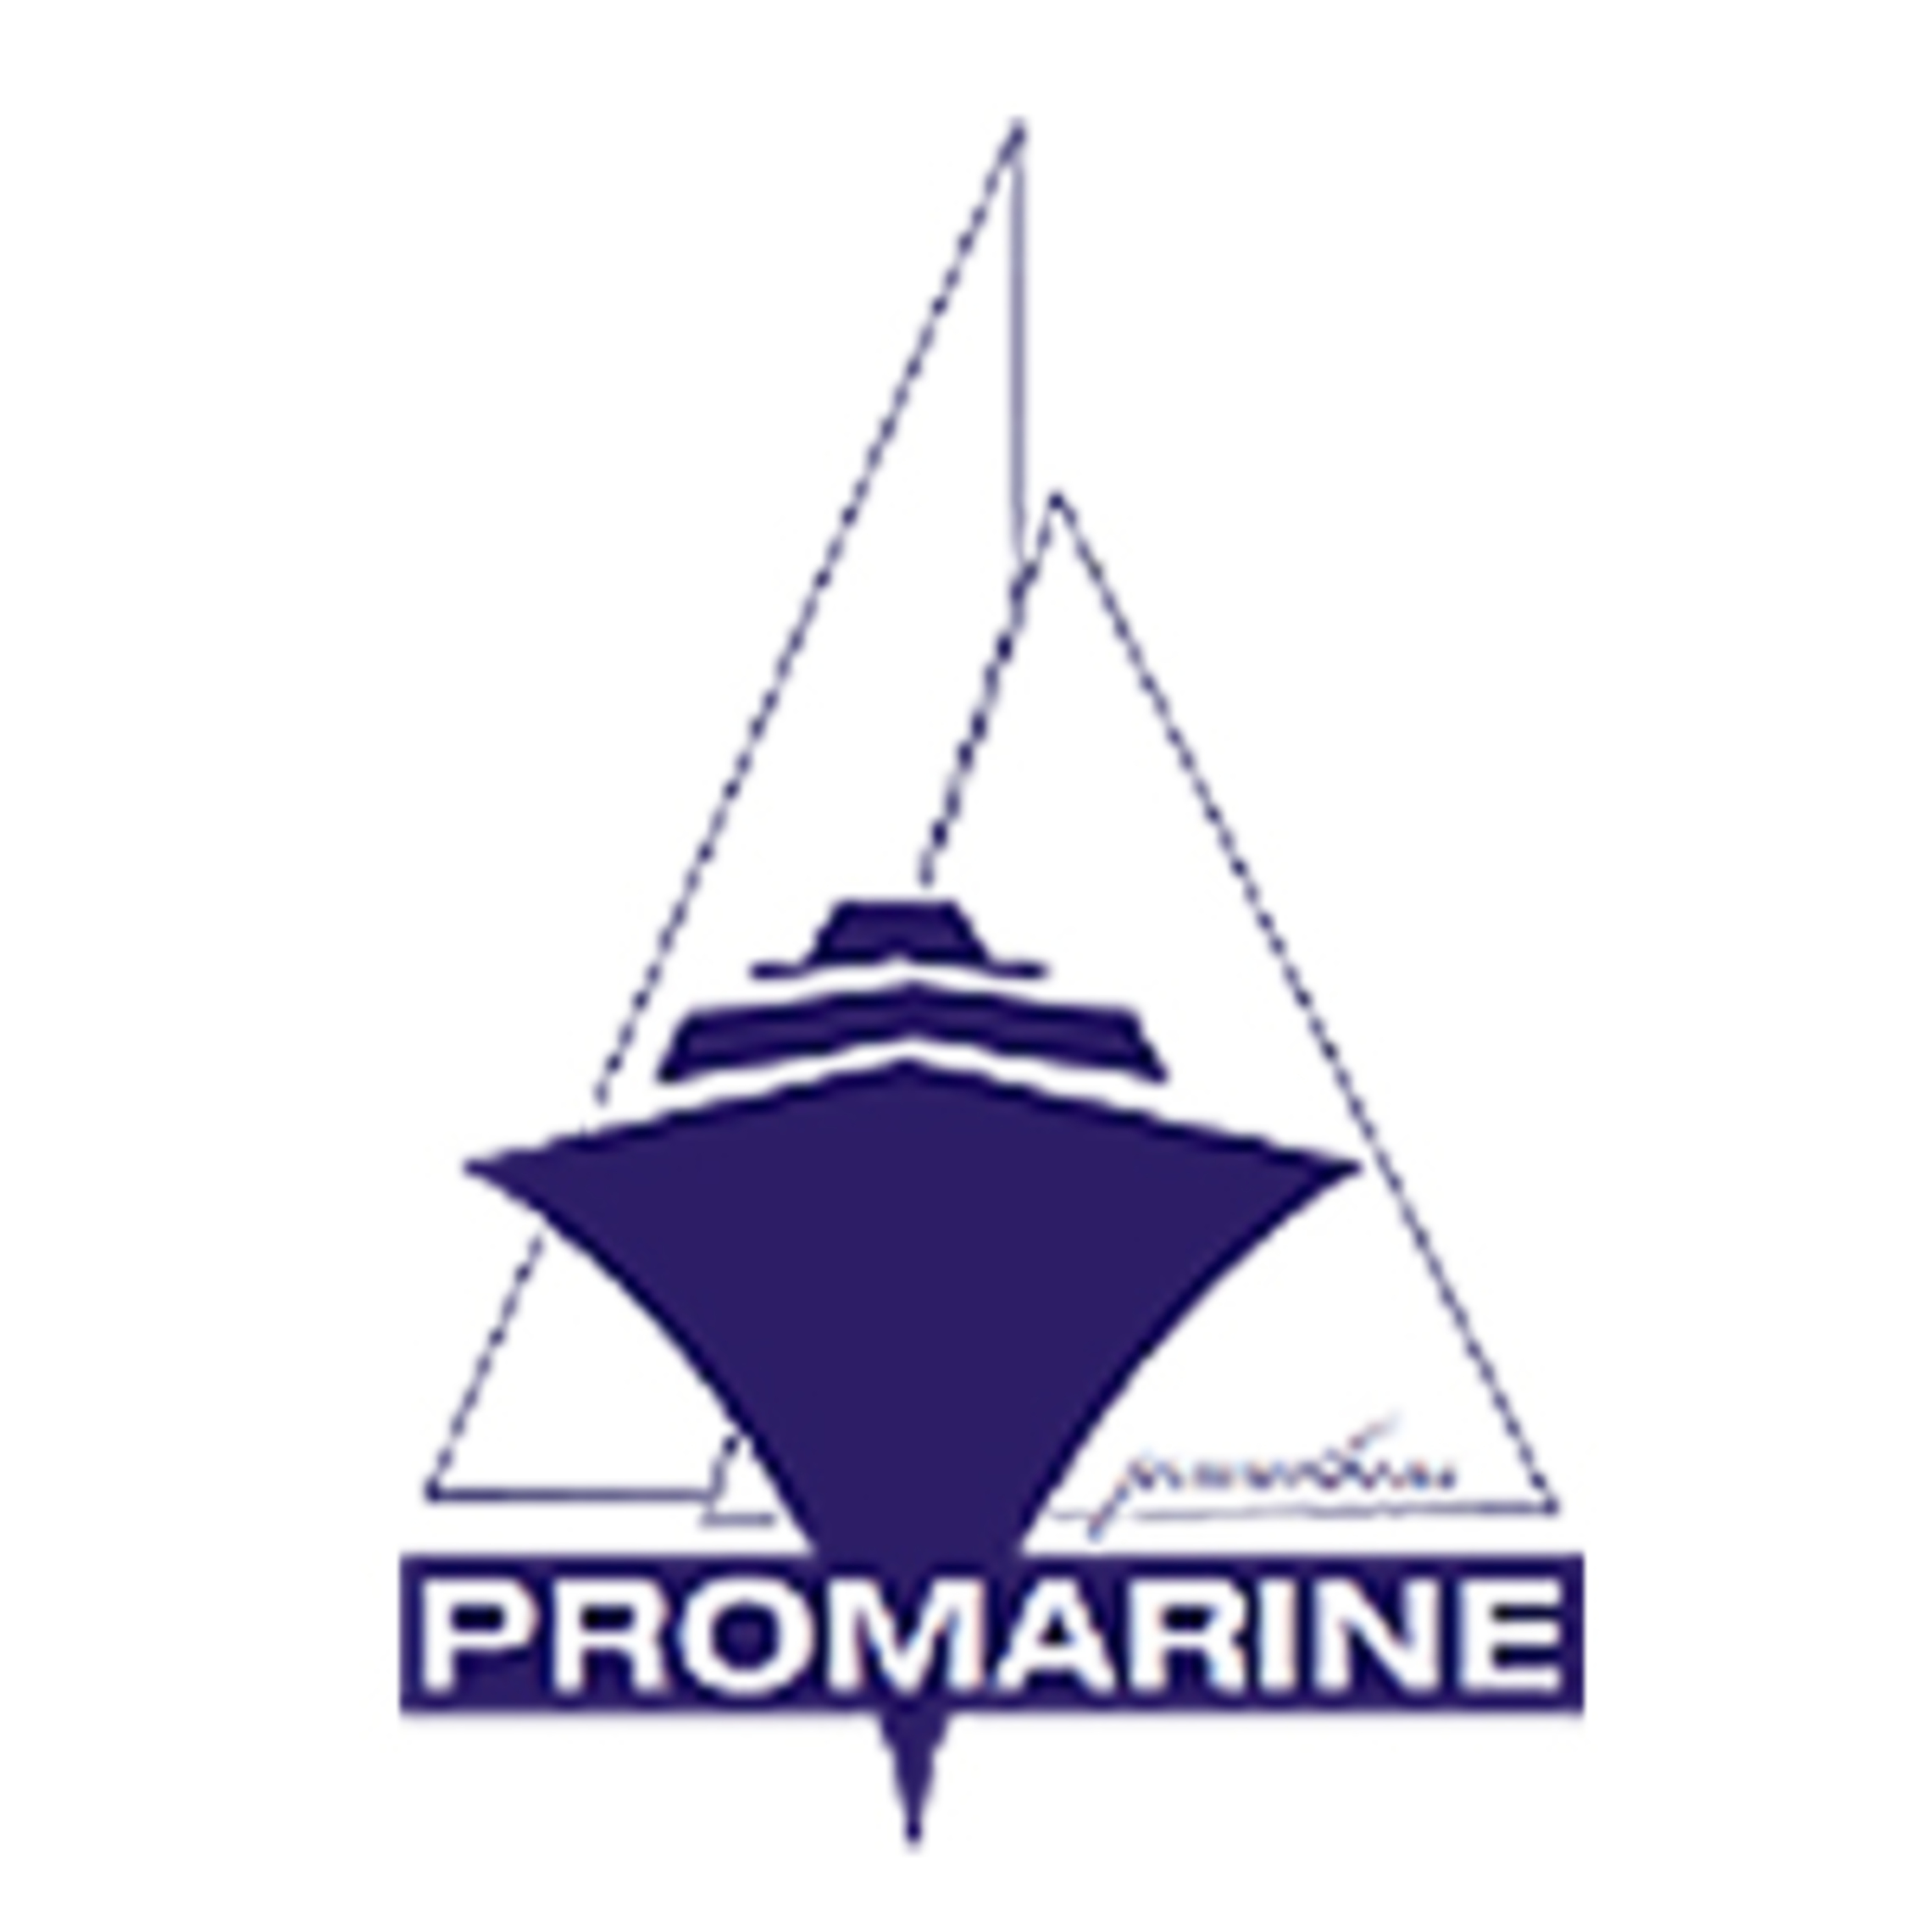 promarine- company logo